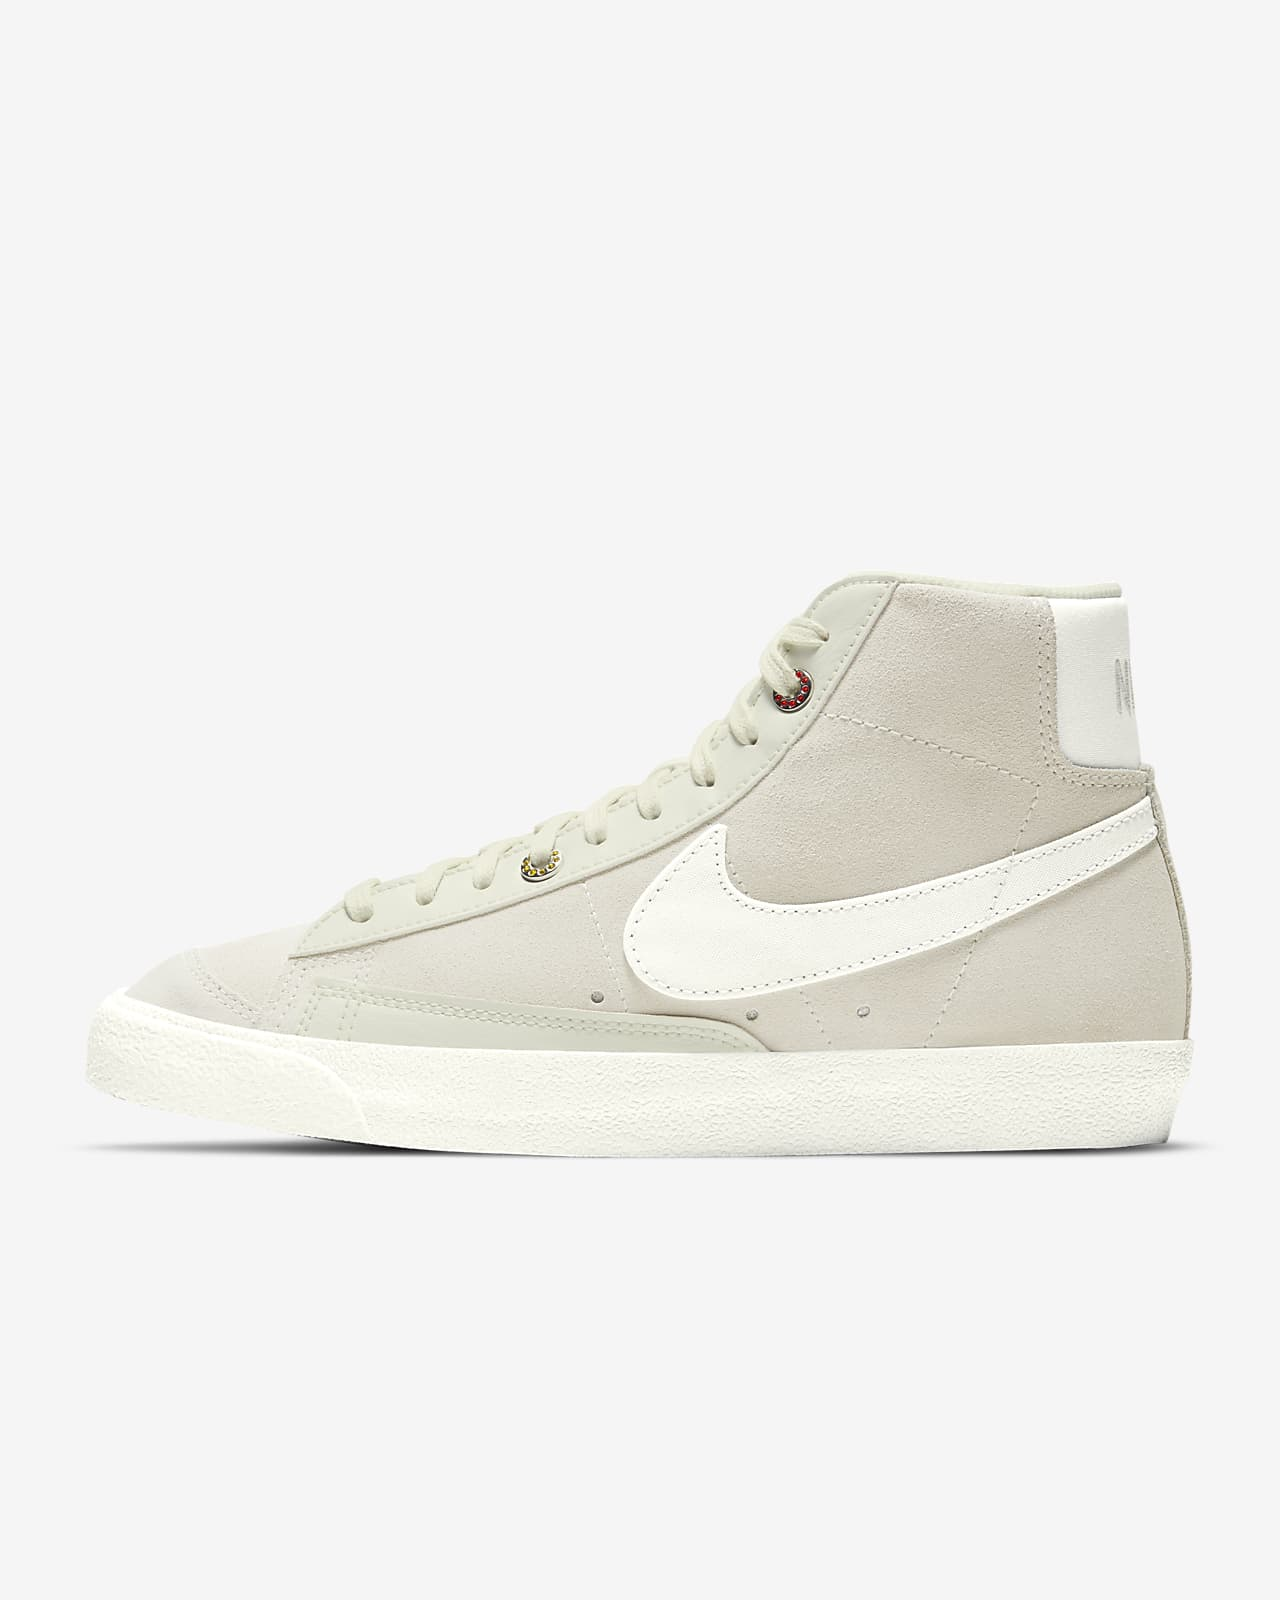 Nike Blazer Mid '77 Women's Shoes. Nike BG